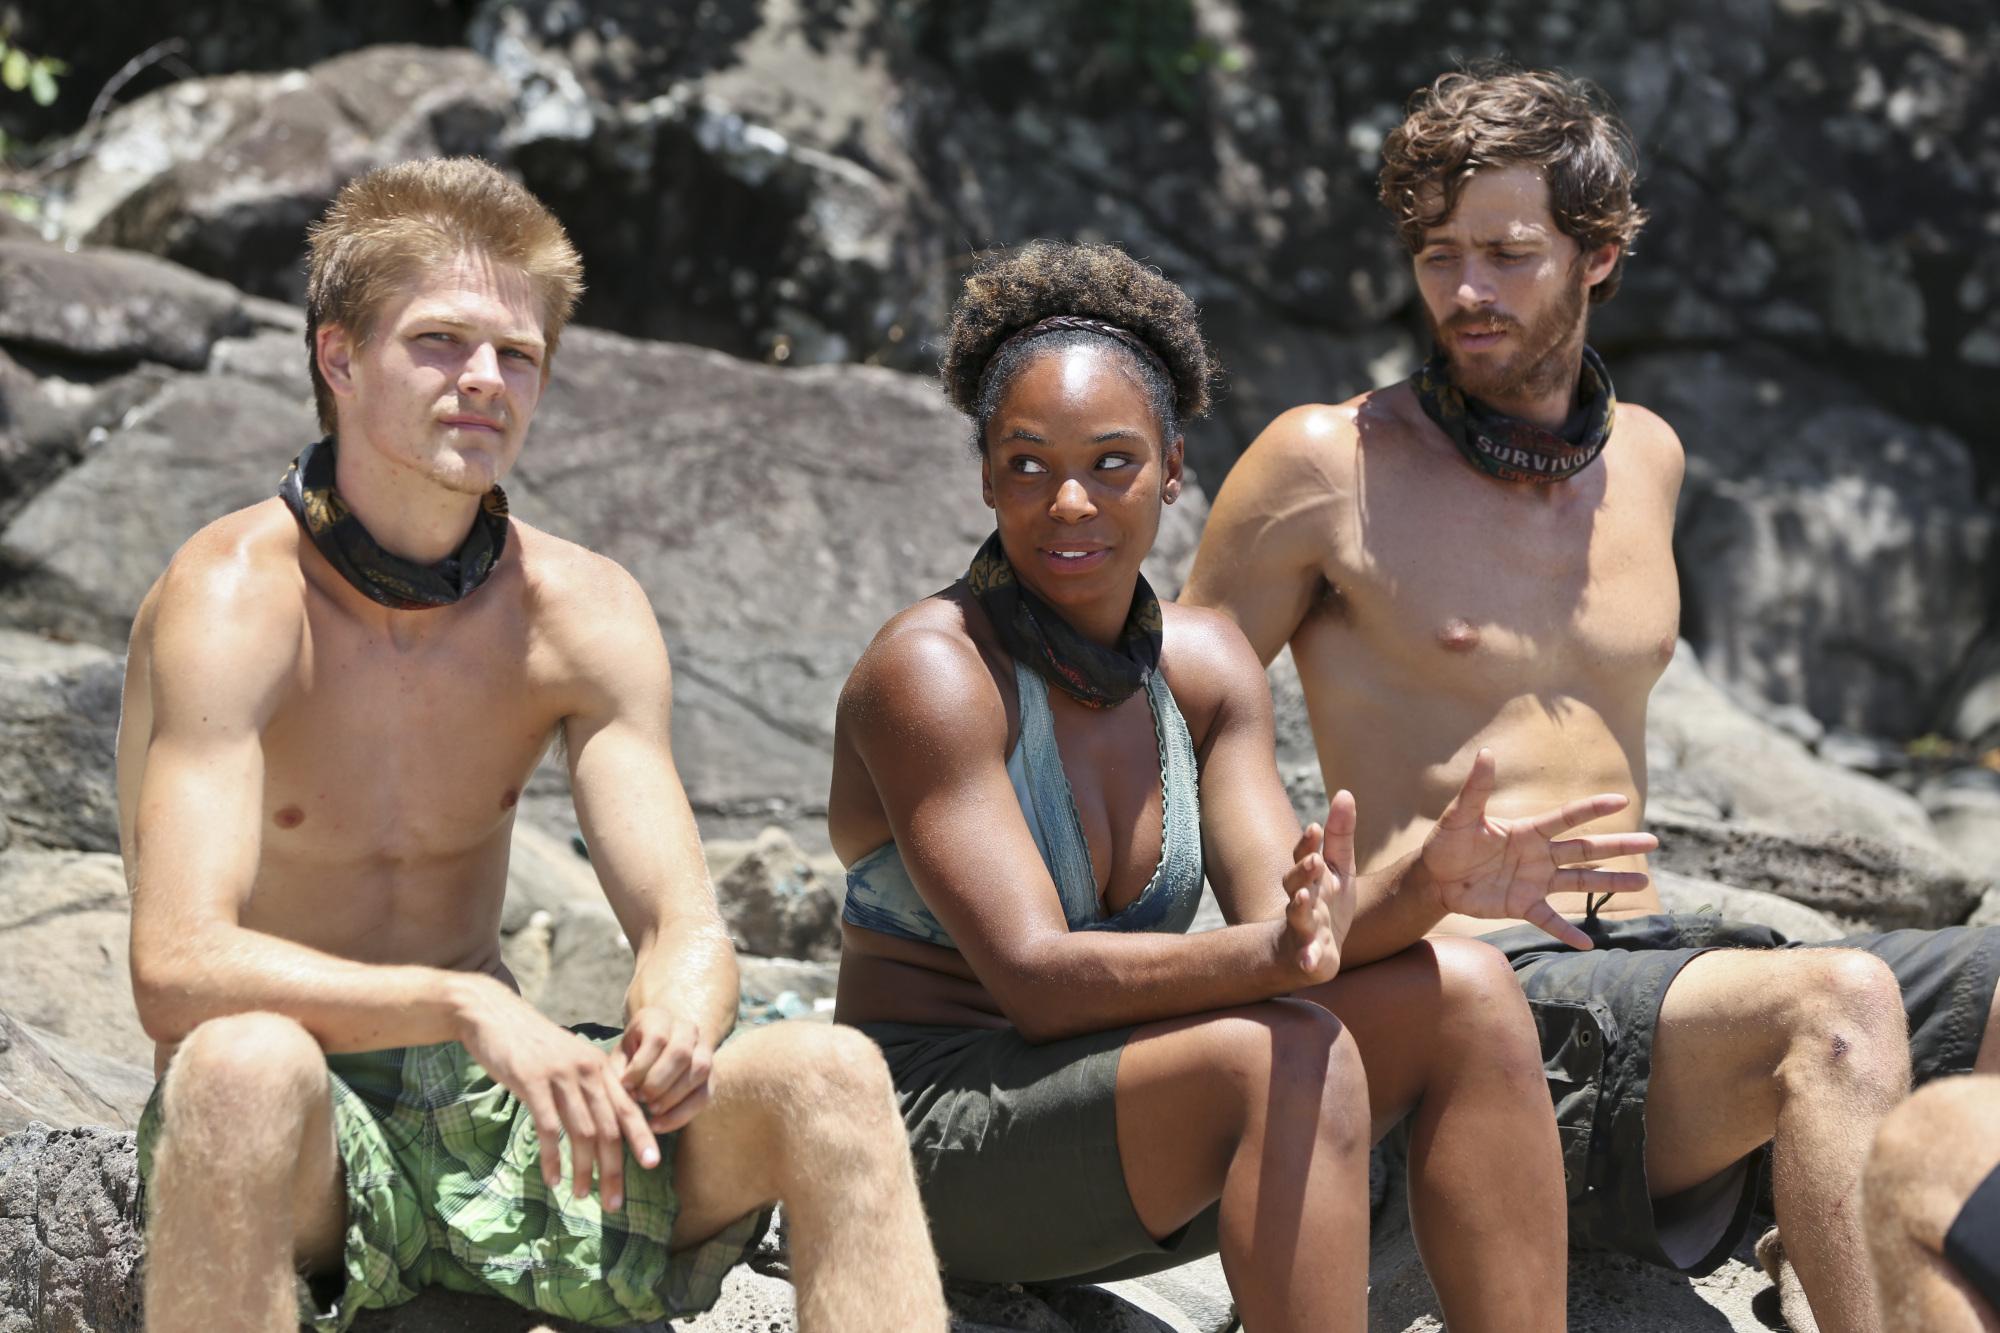 Spencer, Tasha and Jeremiah in Season 28 Episode 9